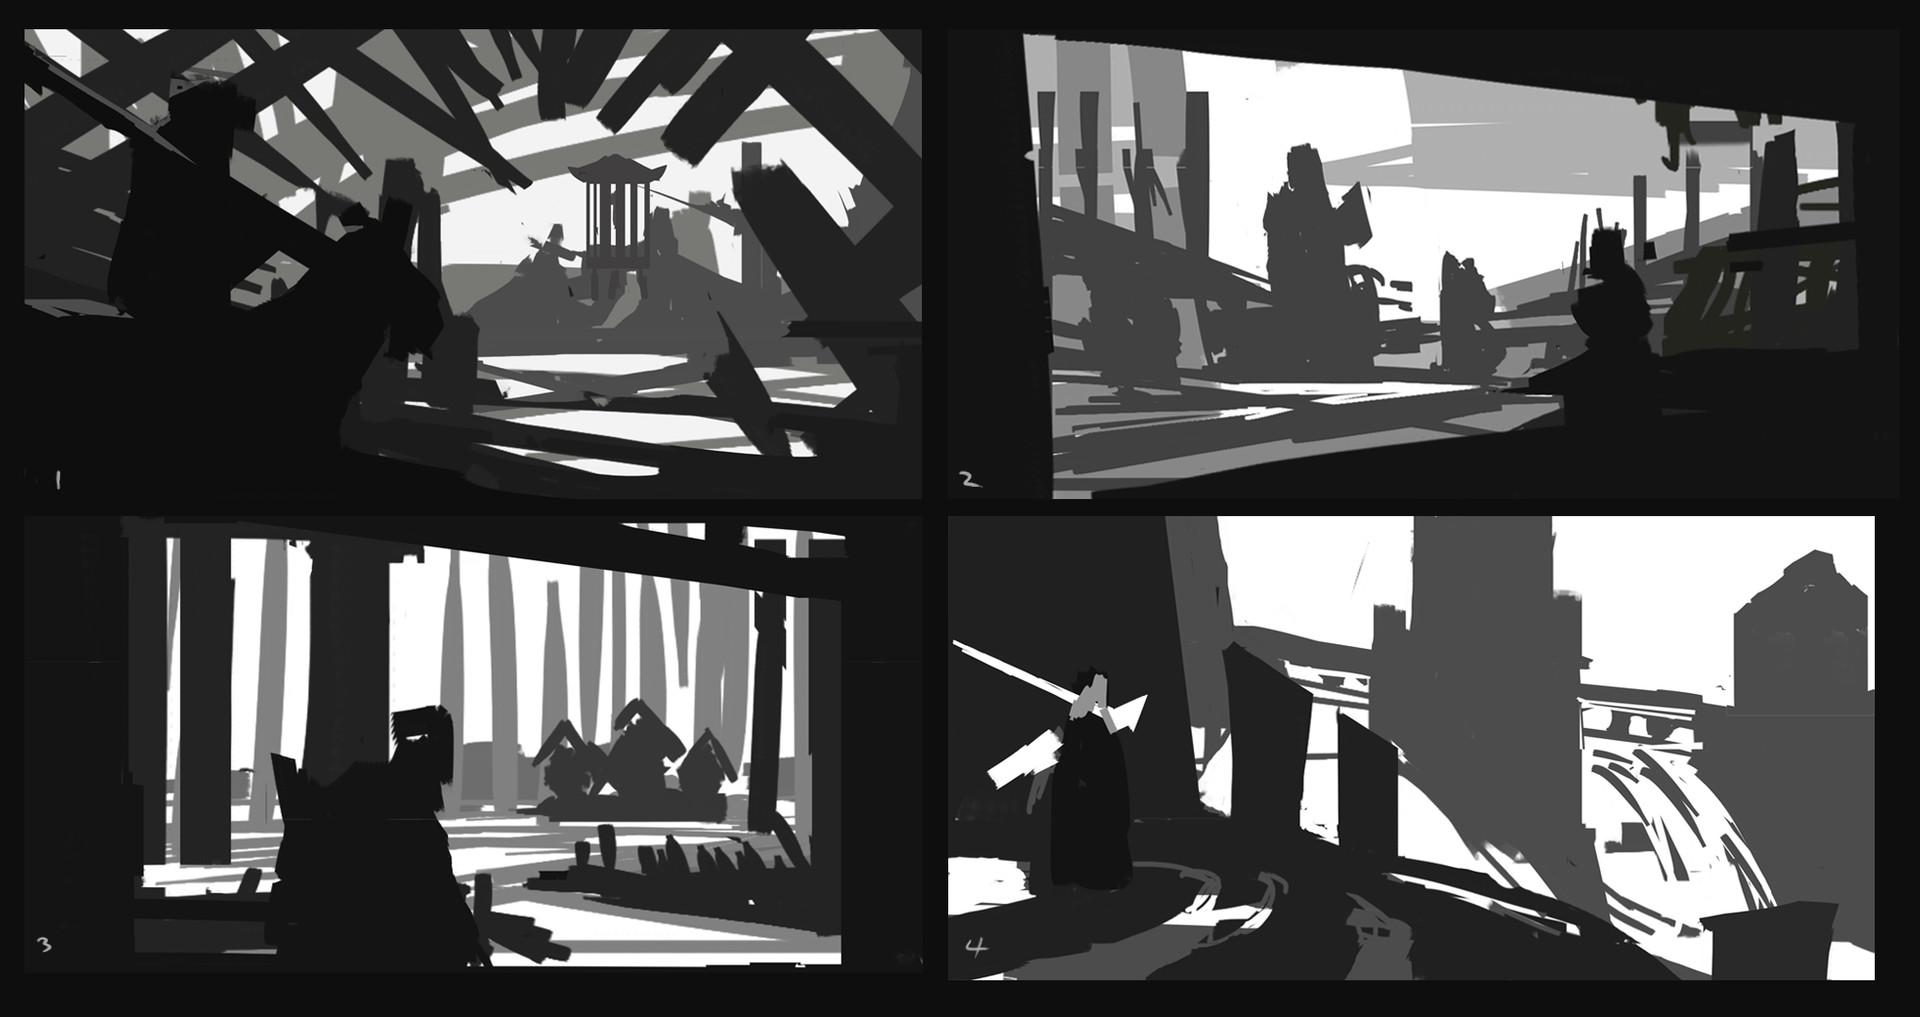 Erik nykvist abstract compositions